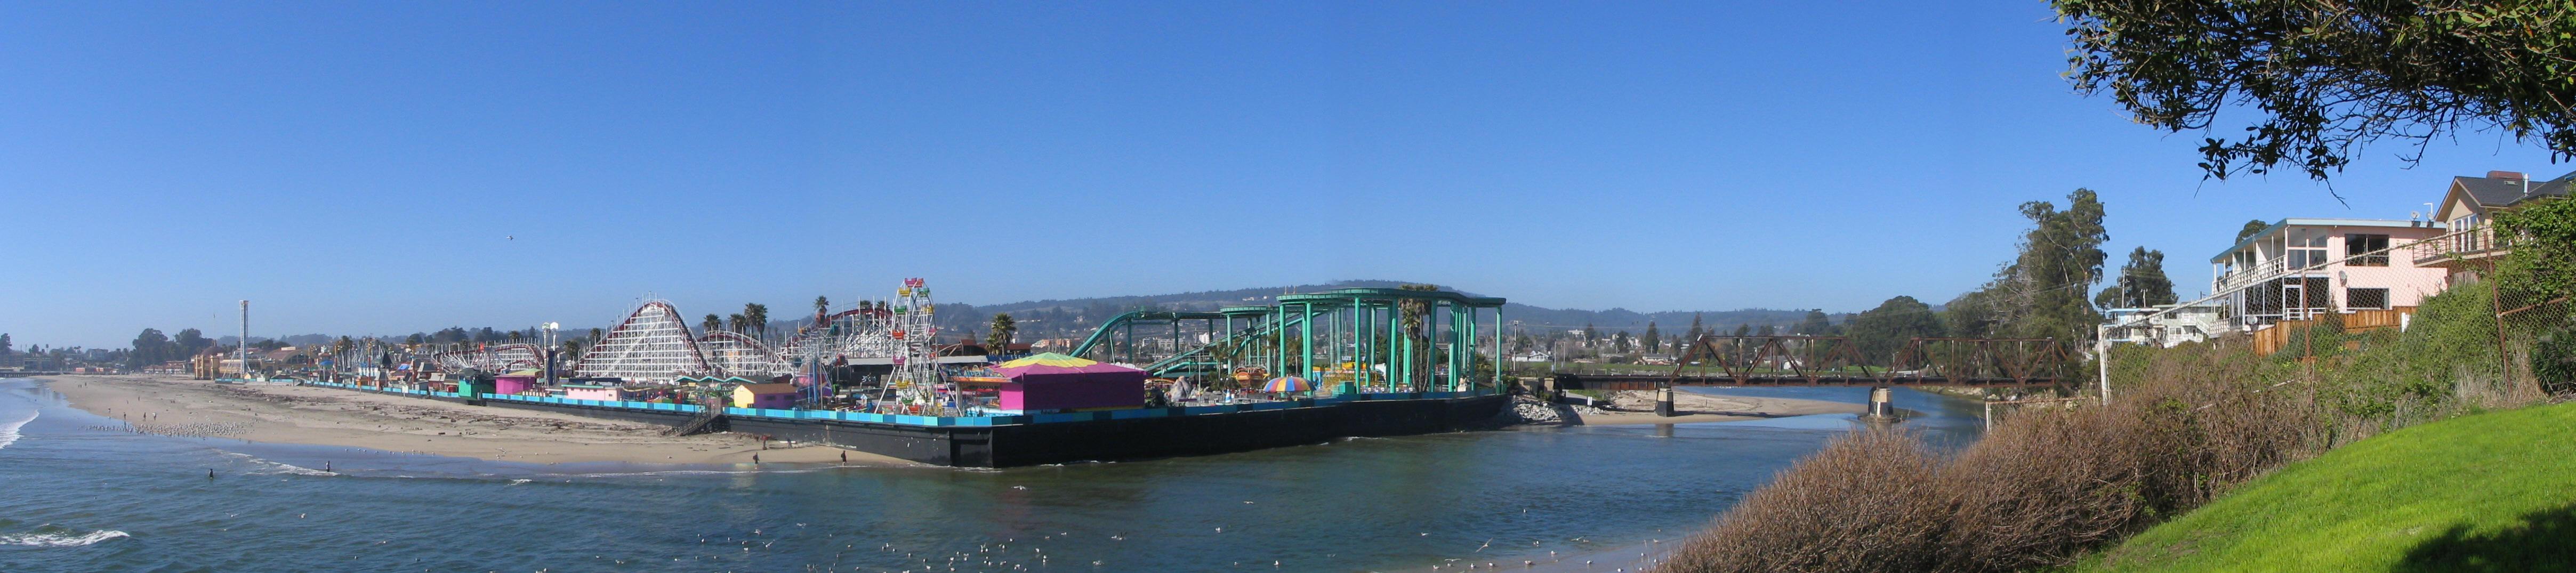 Santa Cruz Boardwalk panorama by jhawklyn